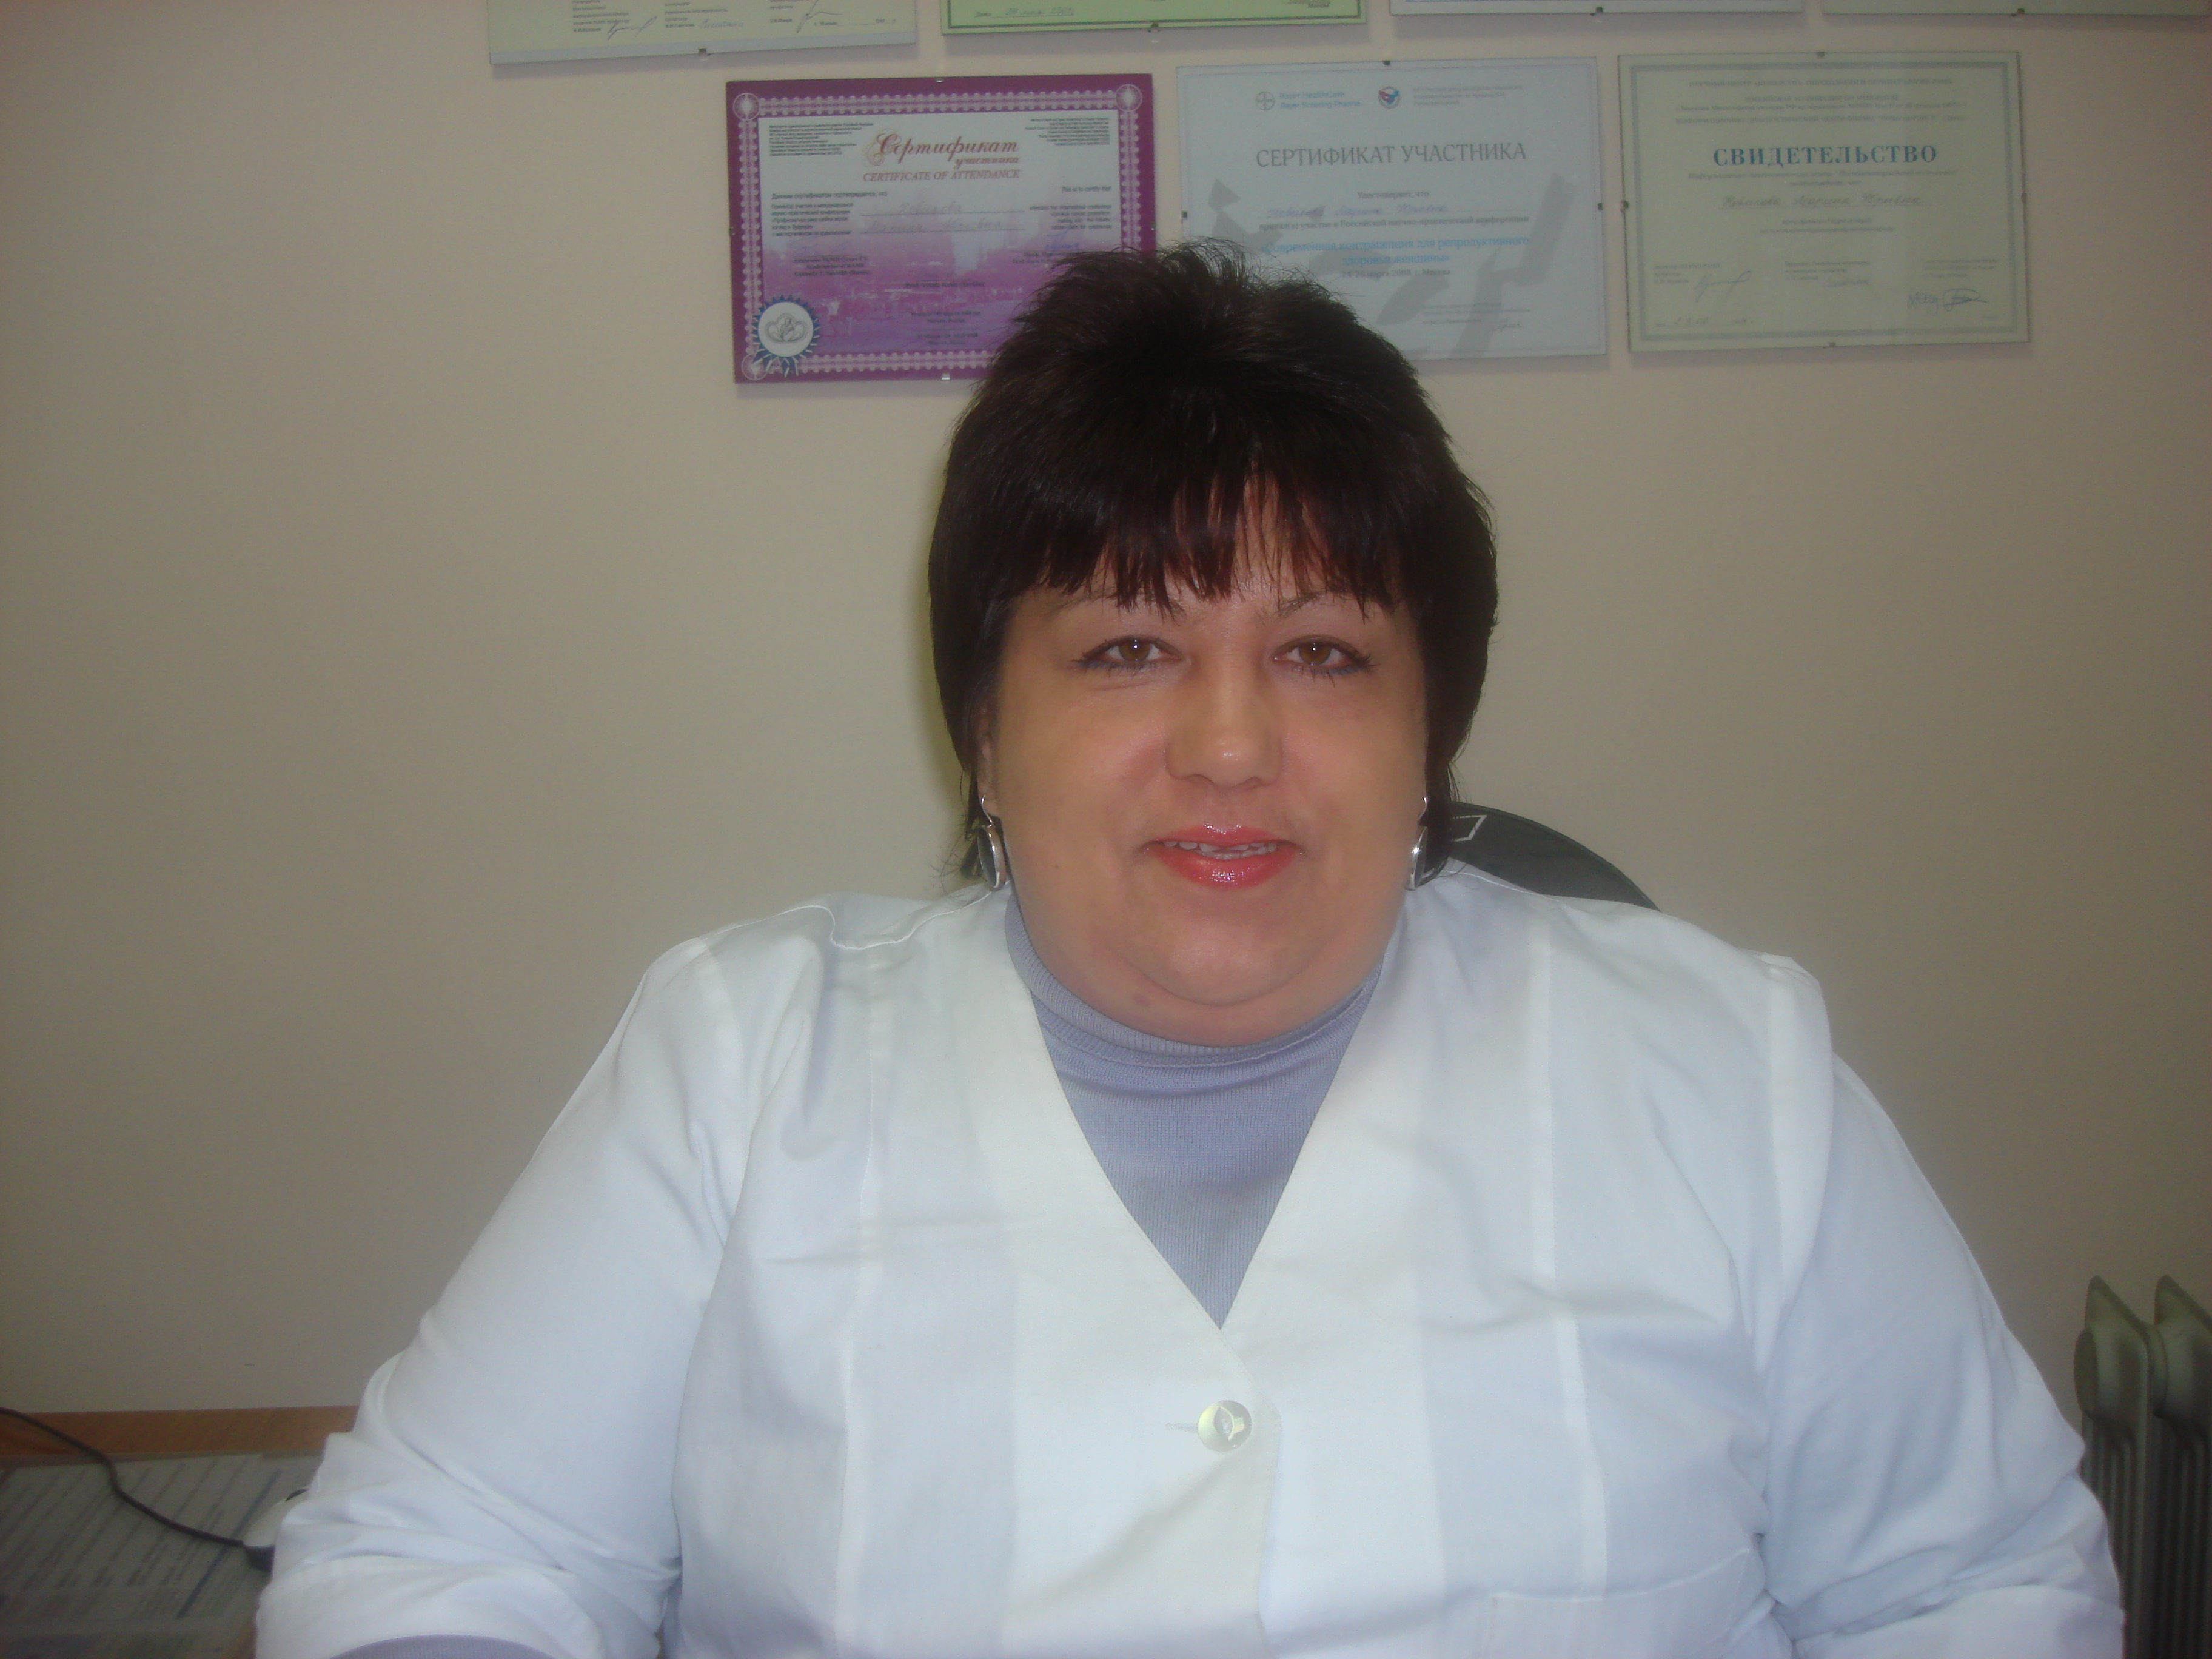 Секс у врачей на приеме 5